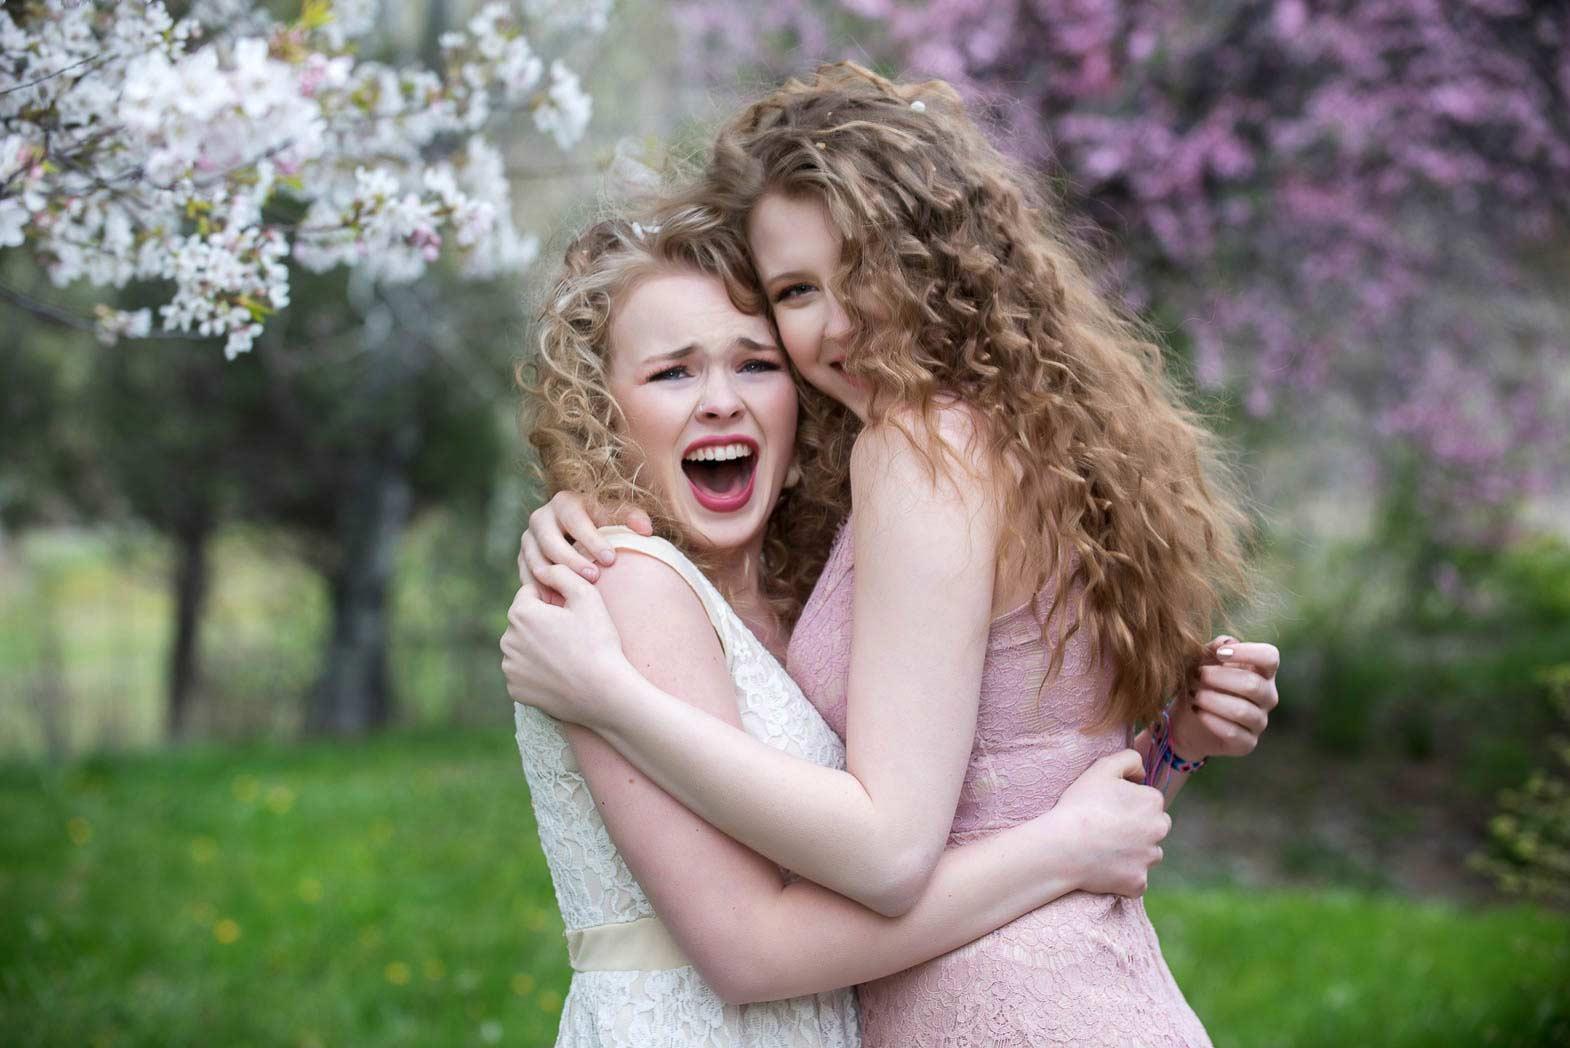 senior girls hugging and laughing among flowers during senior model shoot